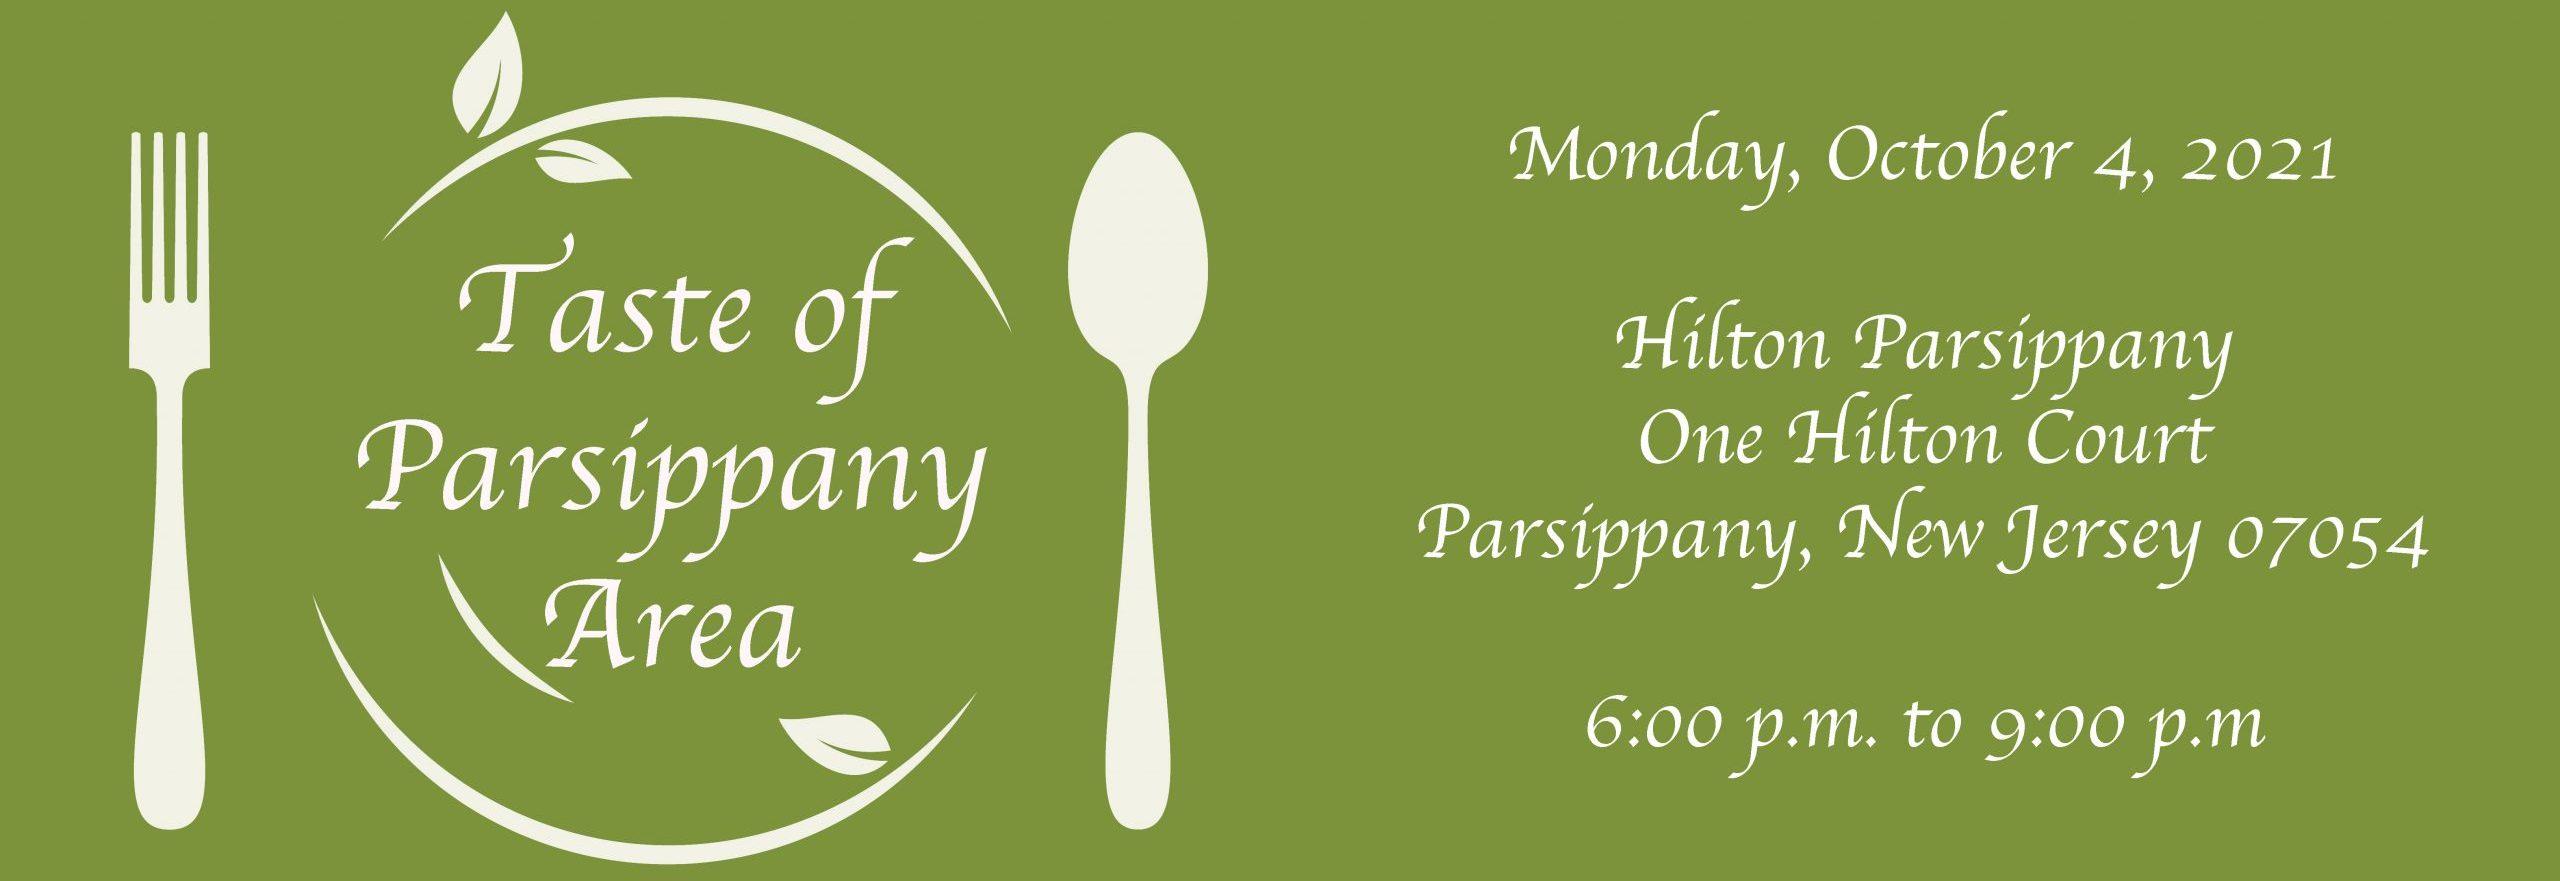 Taste of Parsippany Area 2021